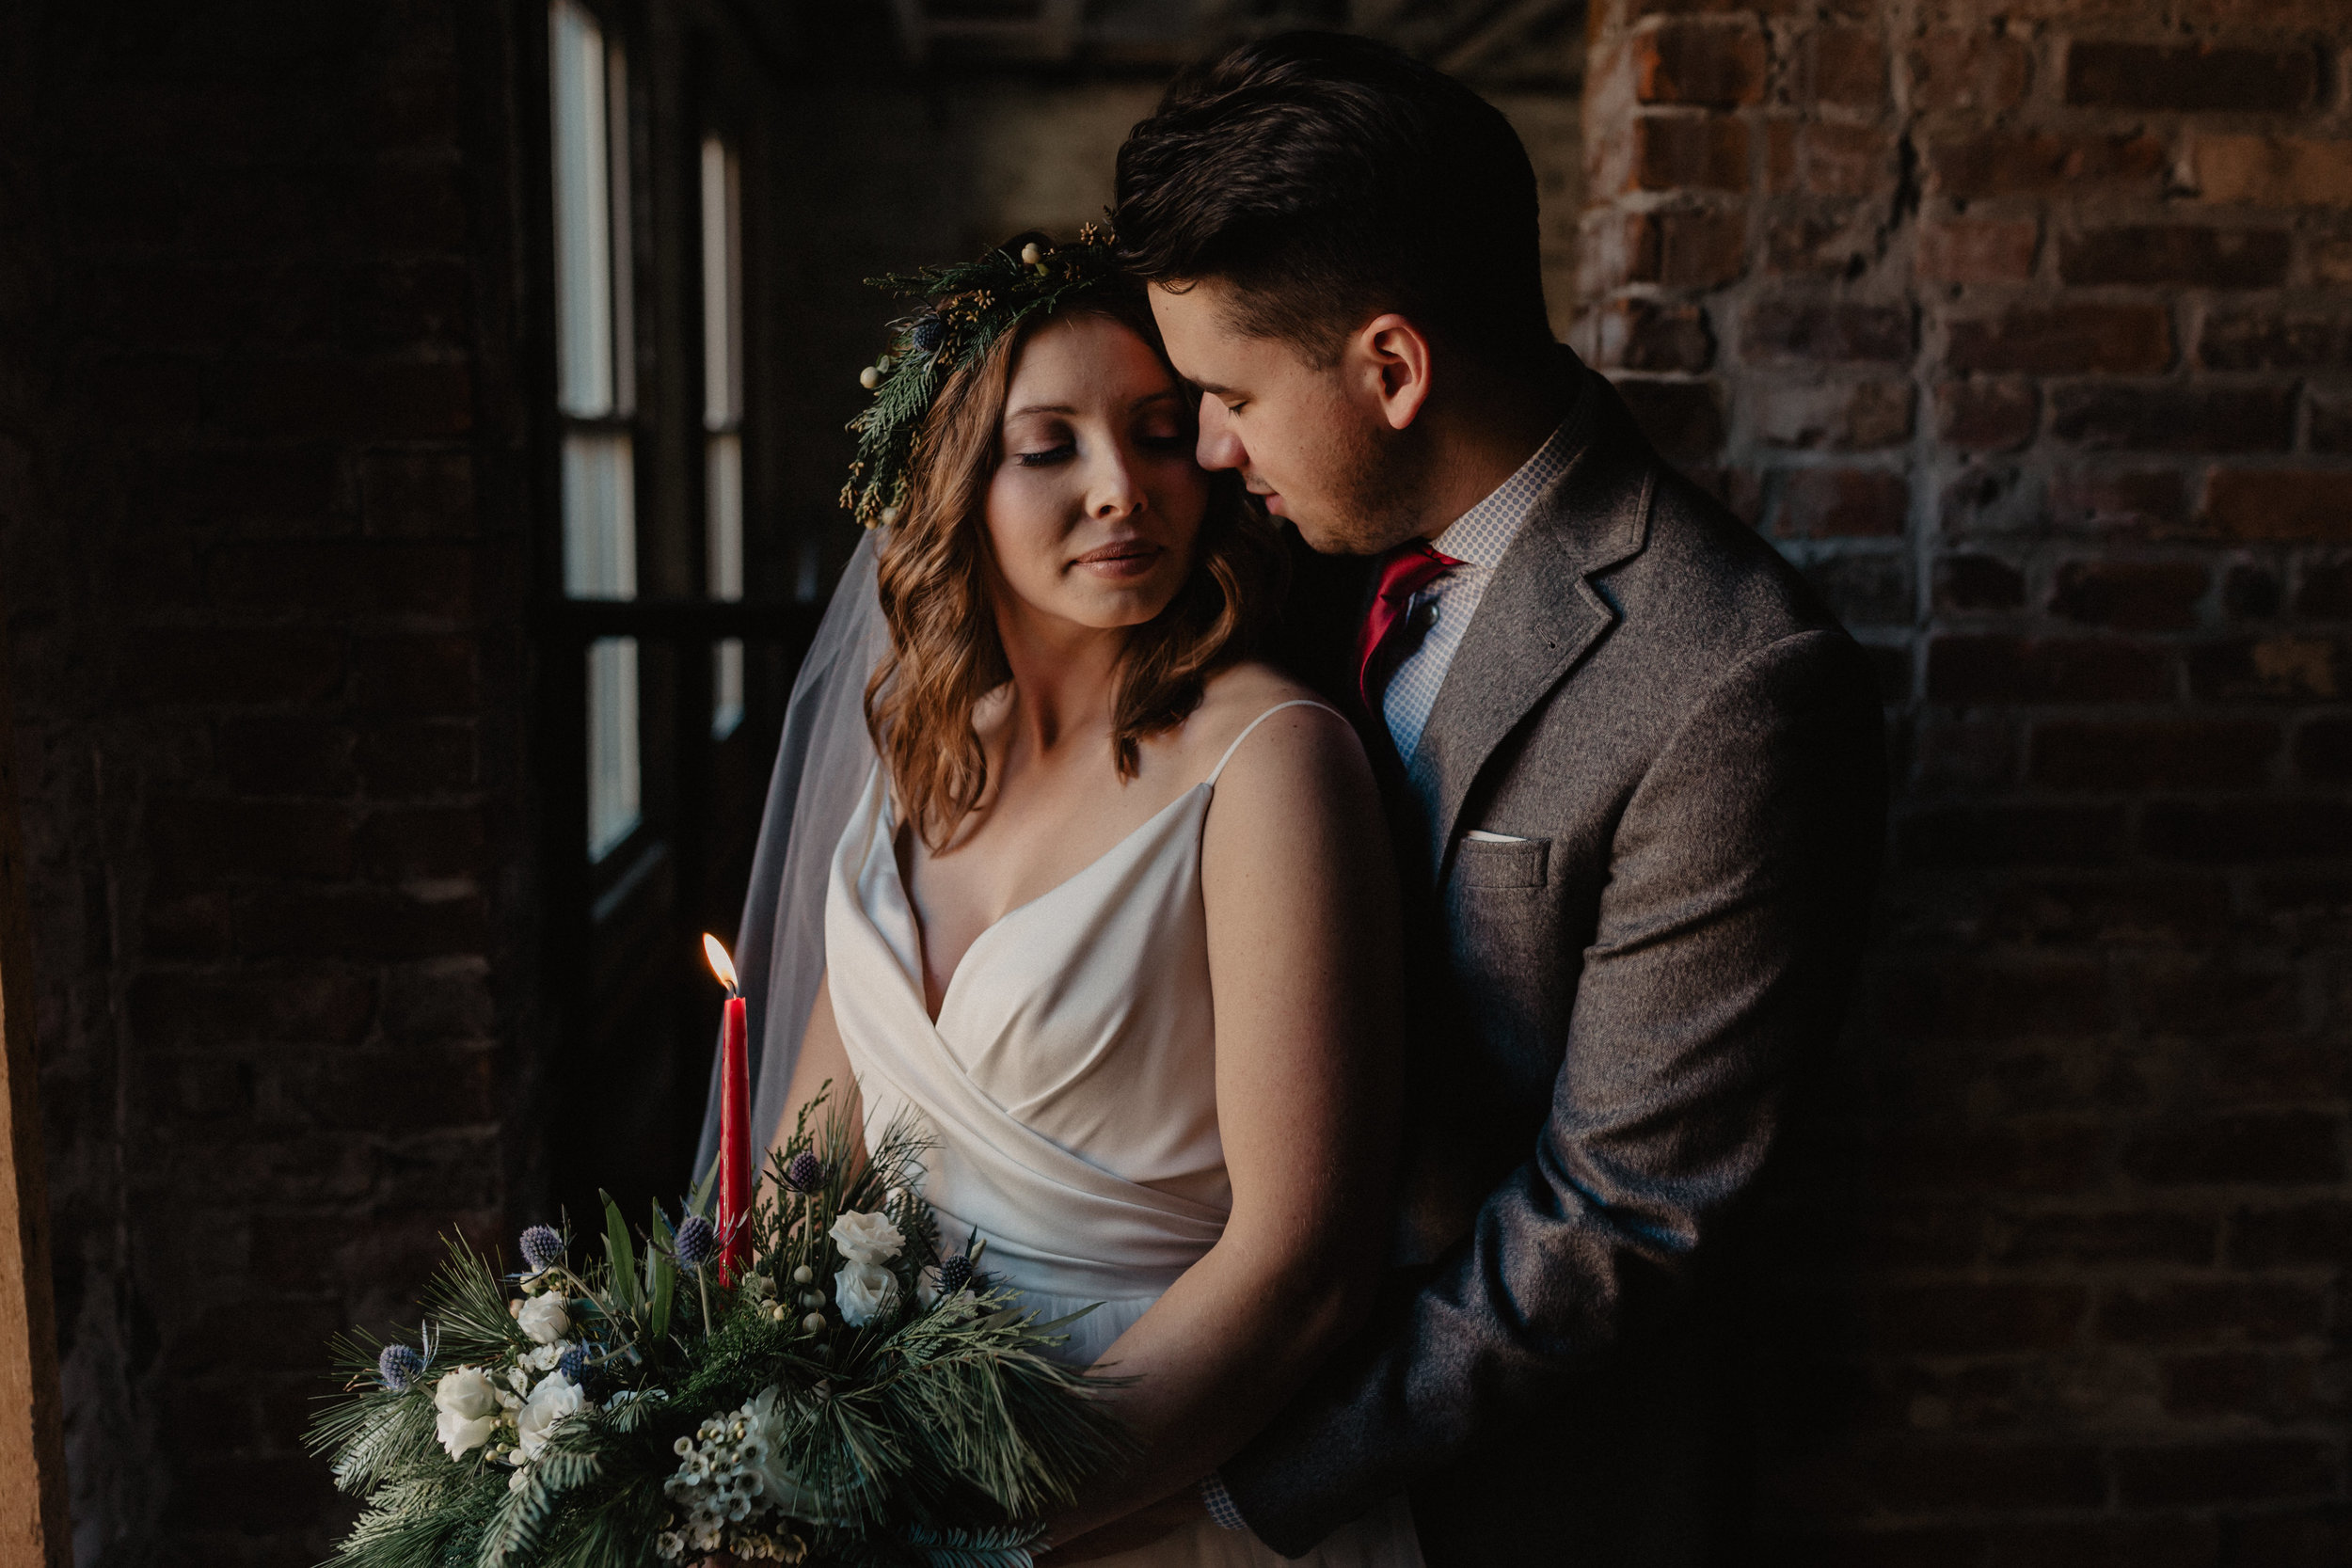 lucas_confectionery_wedding-63.jpg